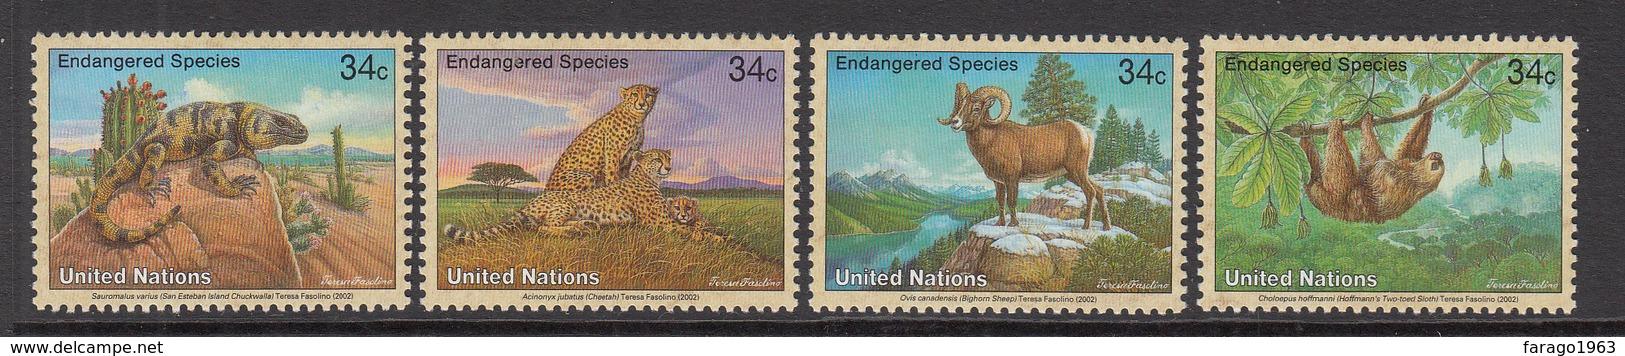 2002 UN New York Endangered Animals Sloth, Sheep, Cheetah, Chuckwalla Set Of 4  MNH - New York – UN Headquarters